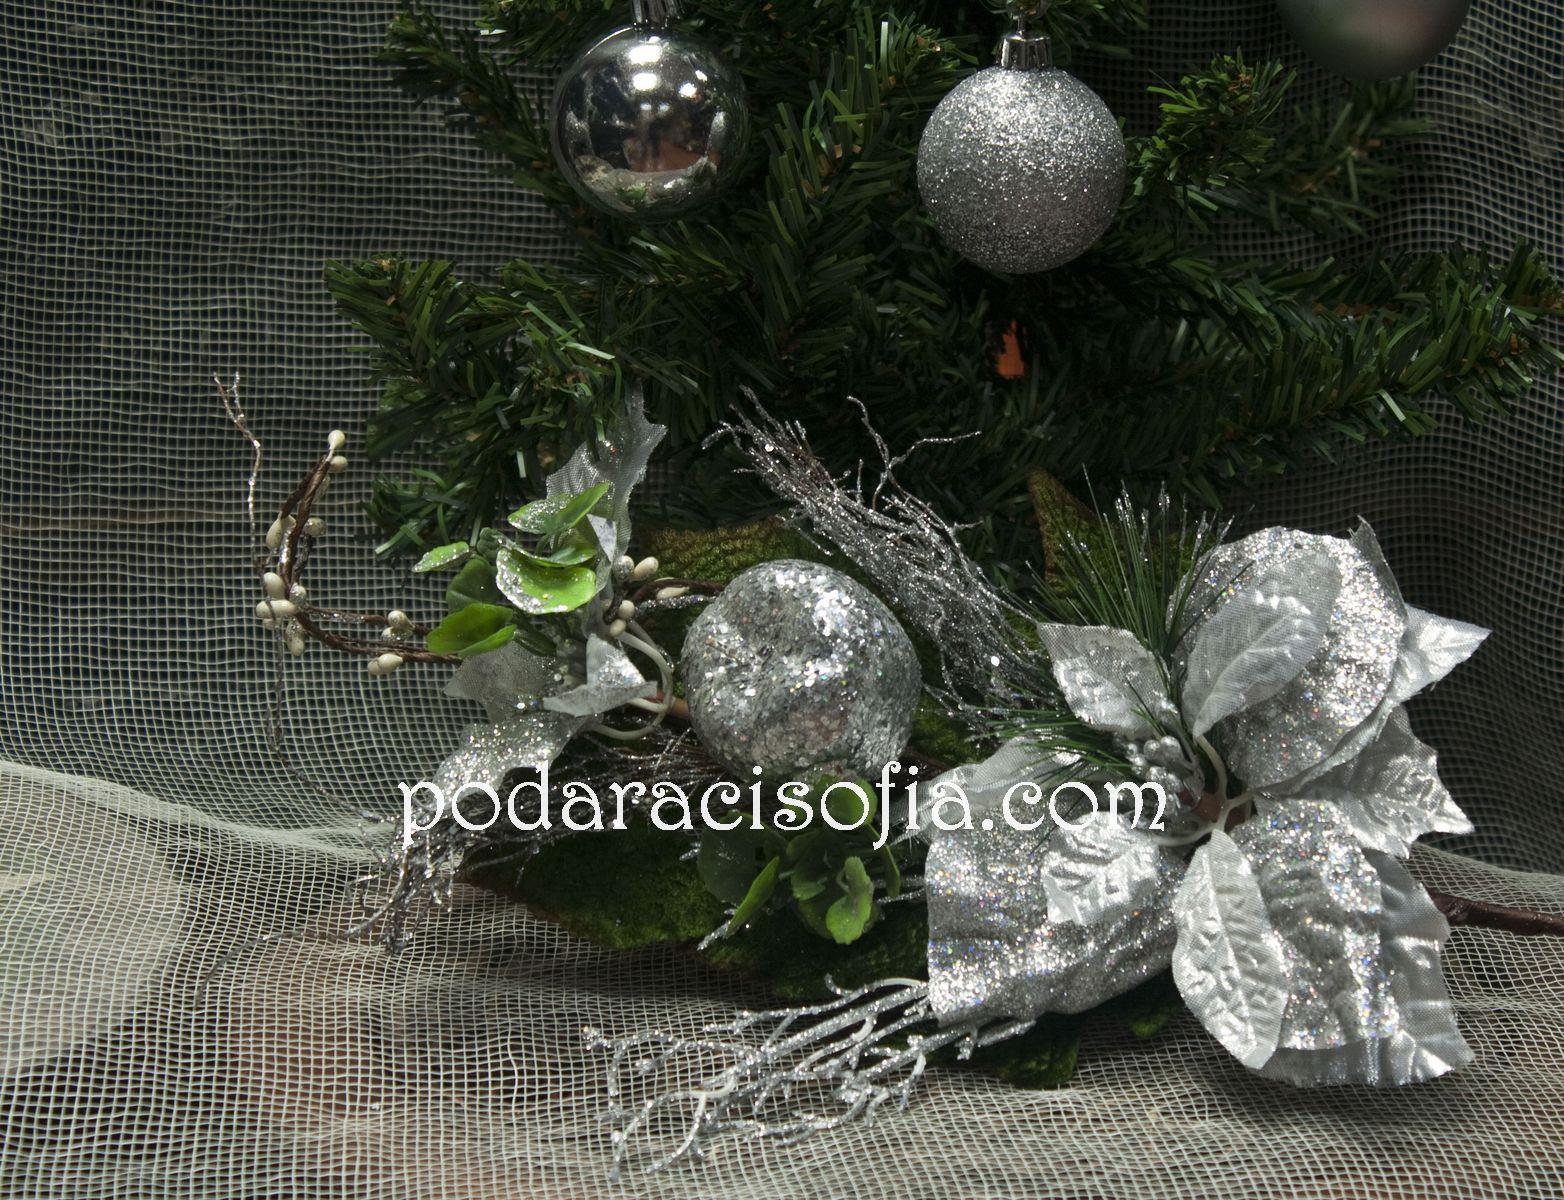 Клон с цветя и декорация в сребърно